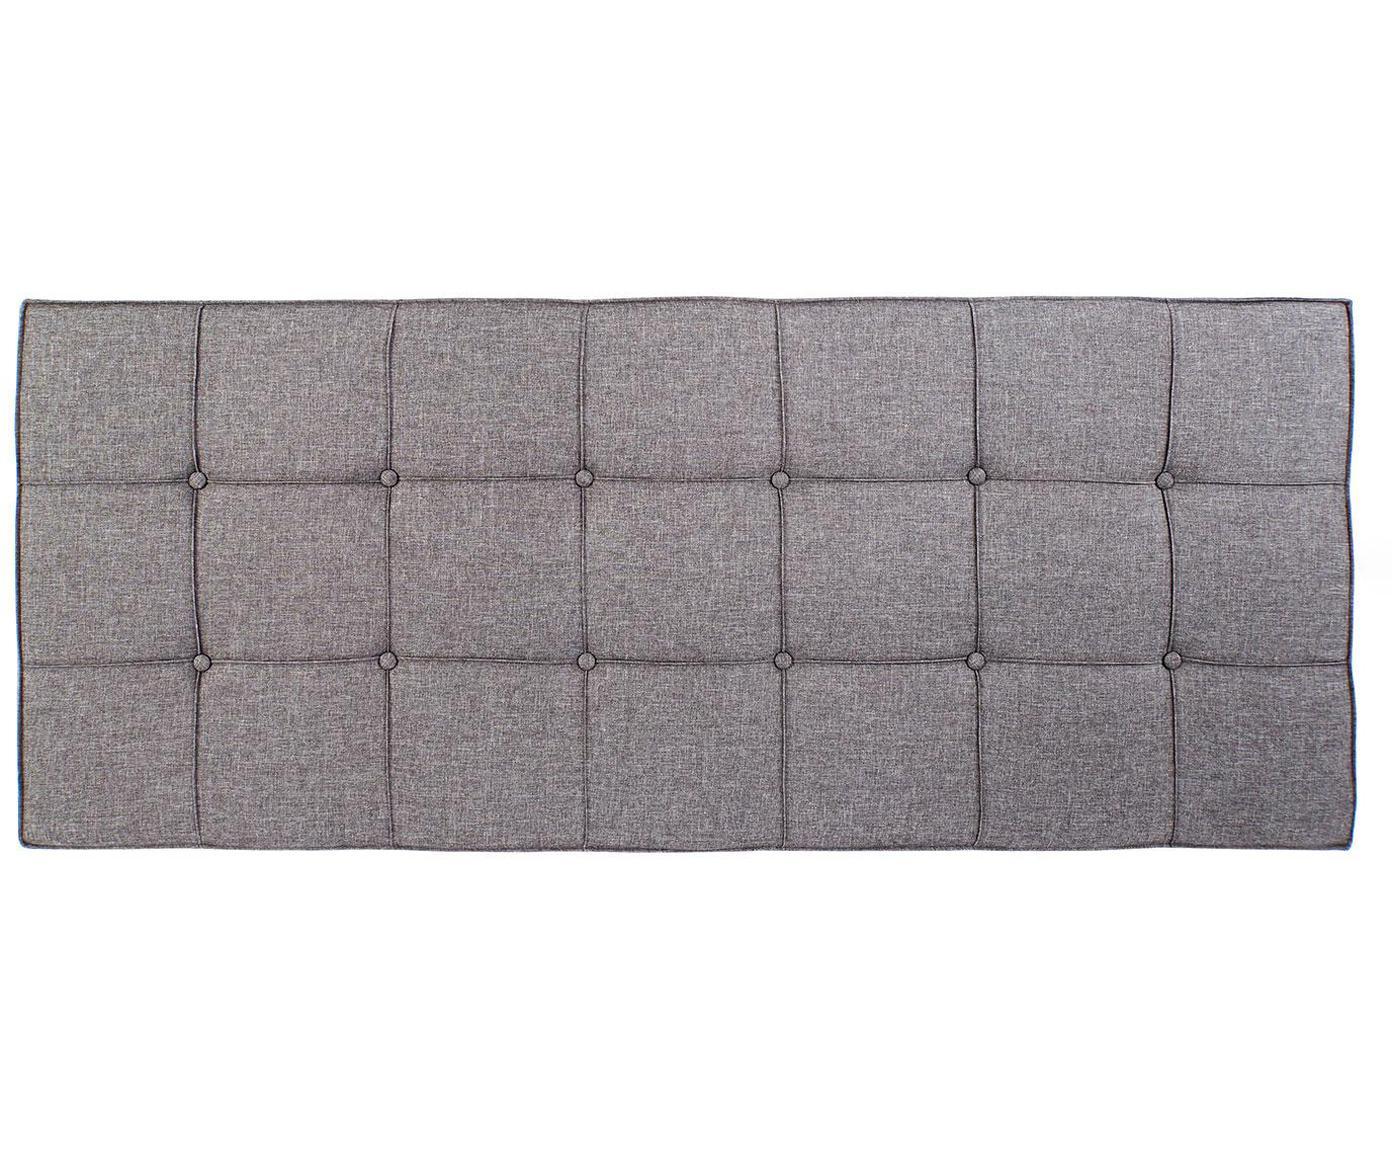 Cabecero tapizado Hady, Estructura: madera, Tapizado: poliéster, Gris, An 160 x Al 120 cm